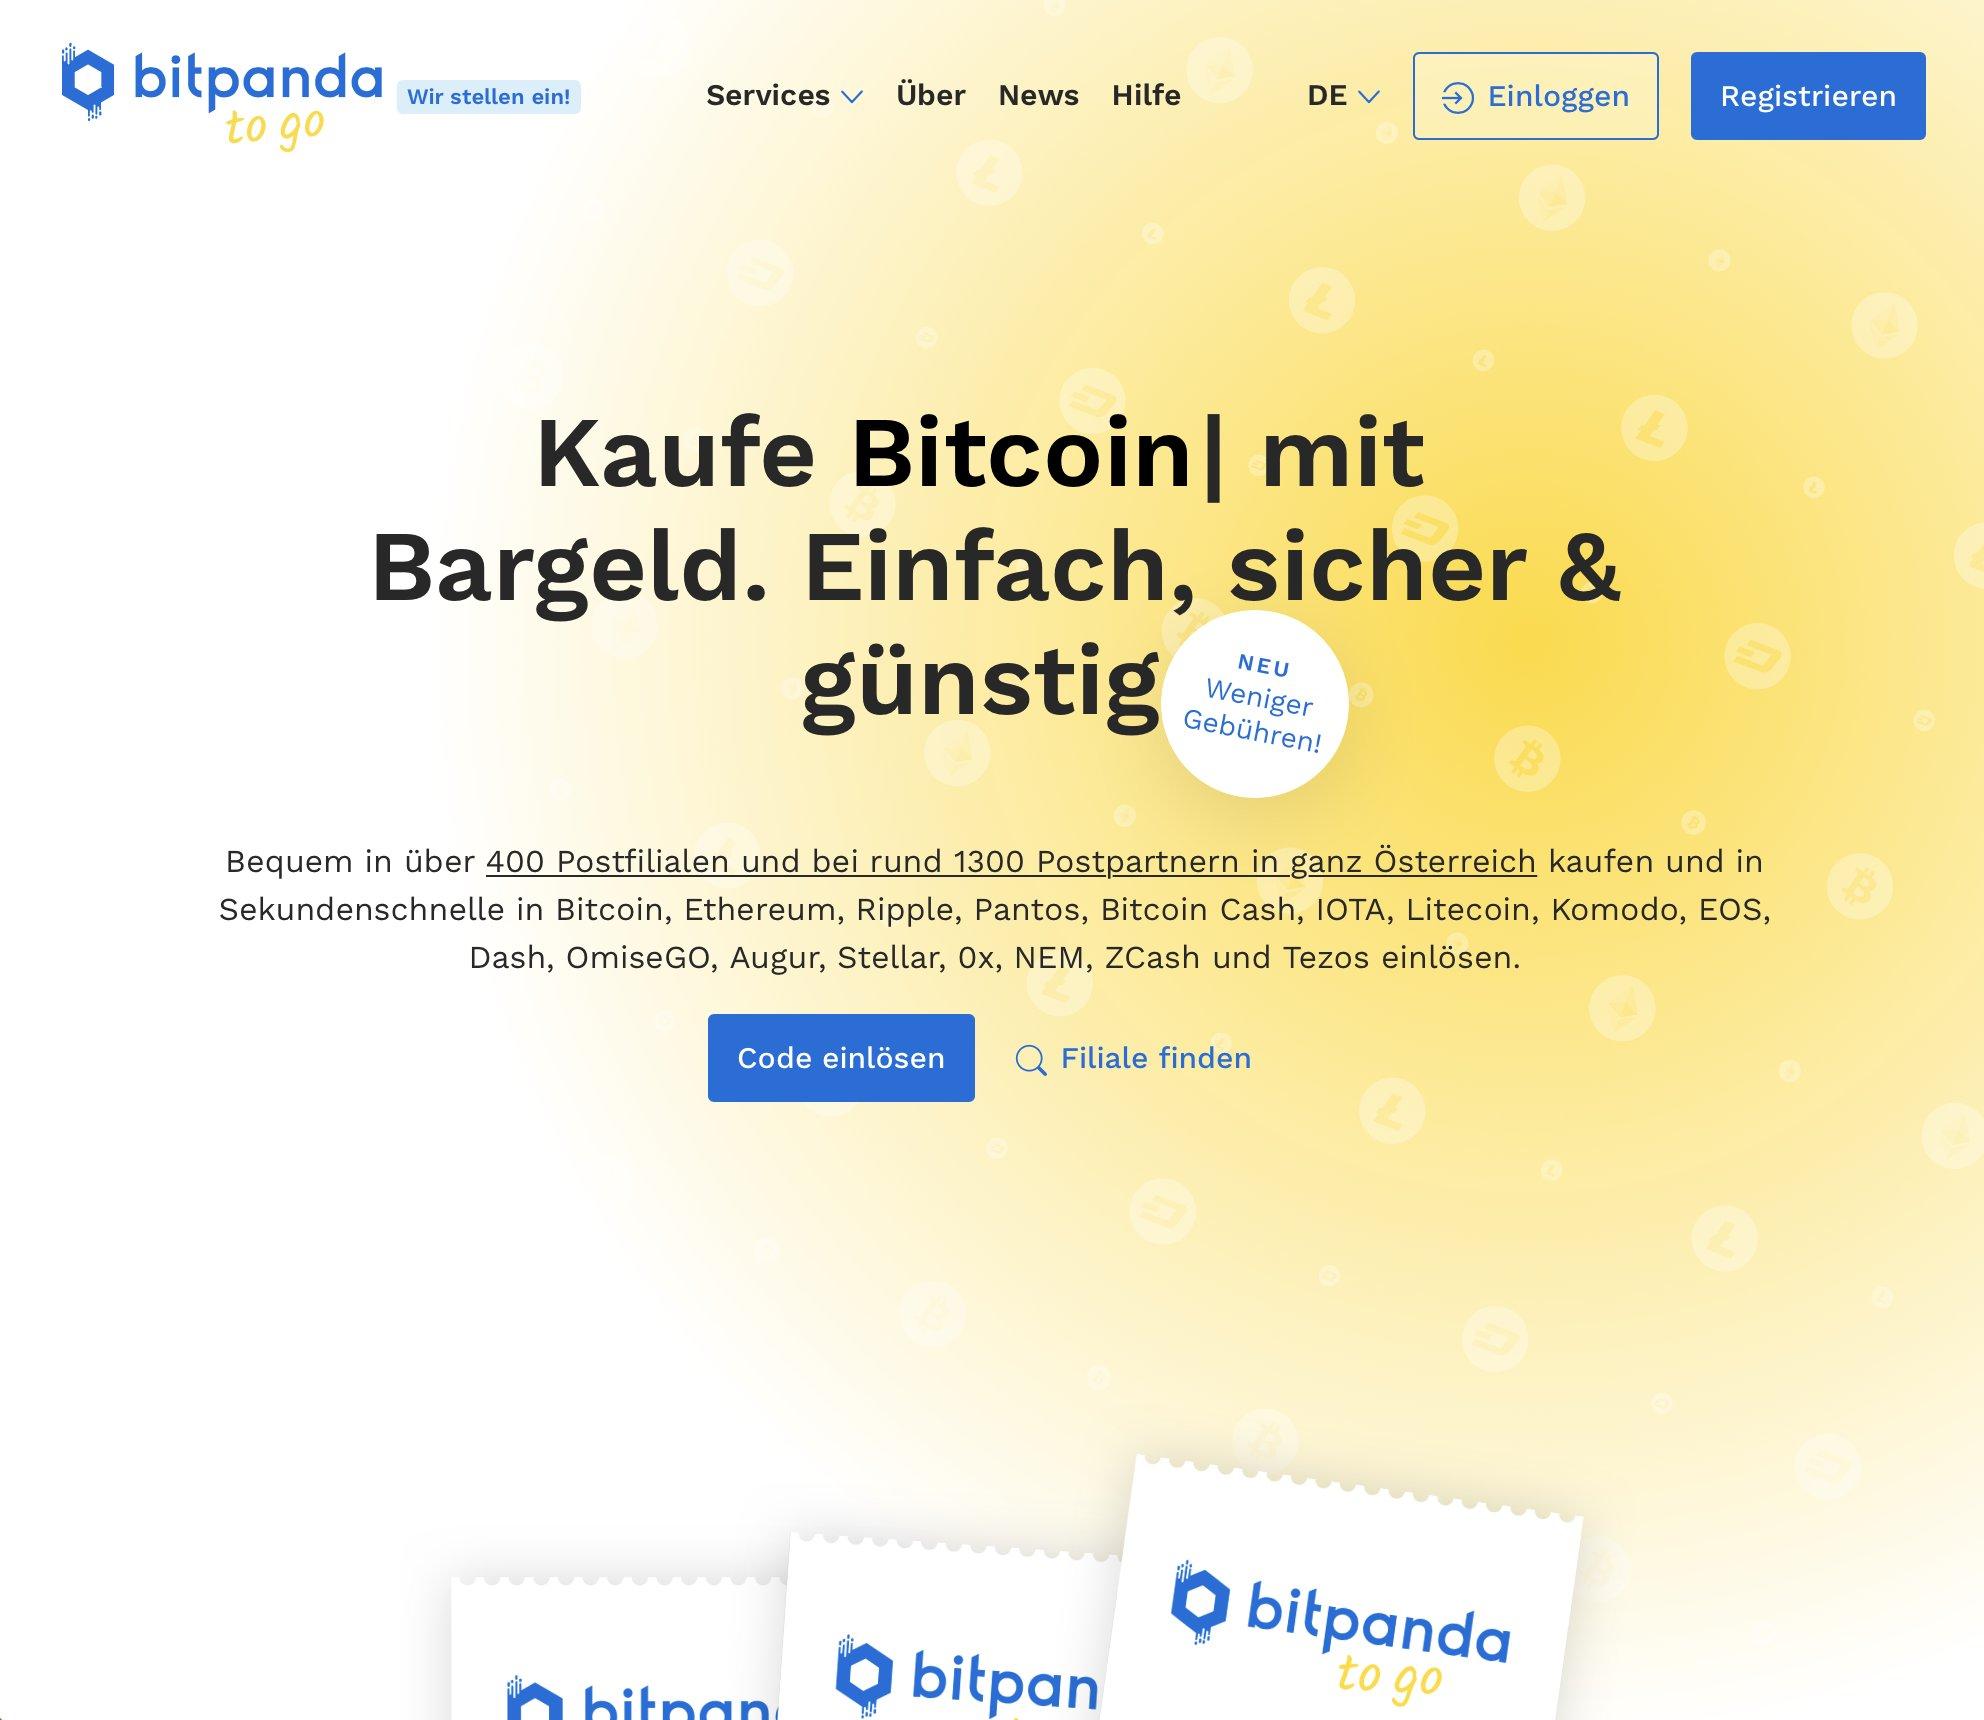 bitcoin-handel gegen investieren eos bester kryptowährungs-handelsbot